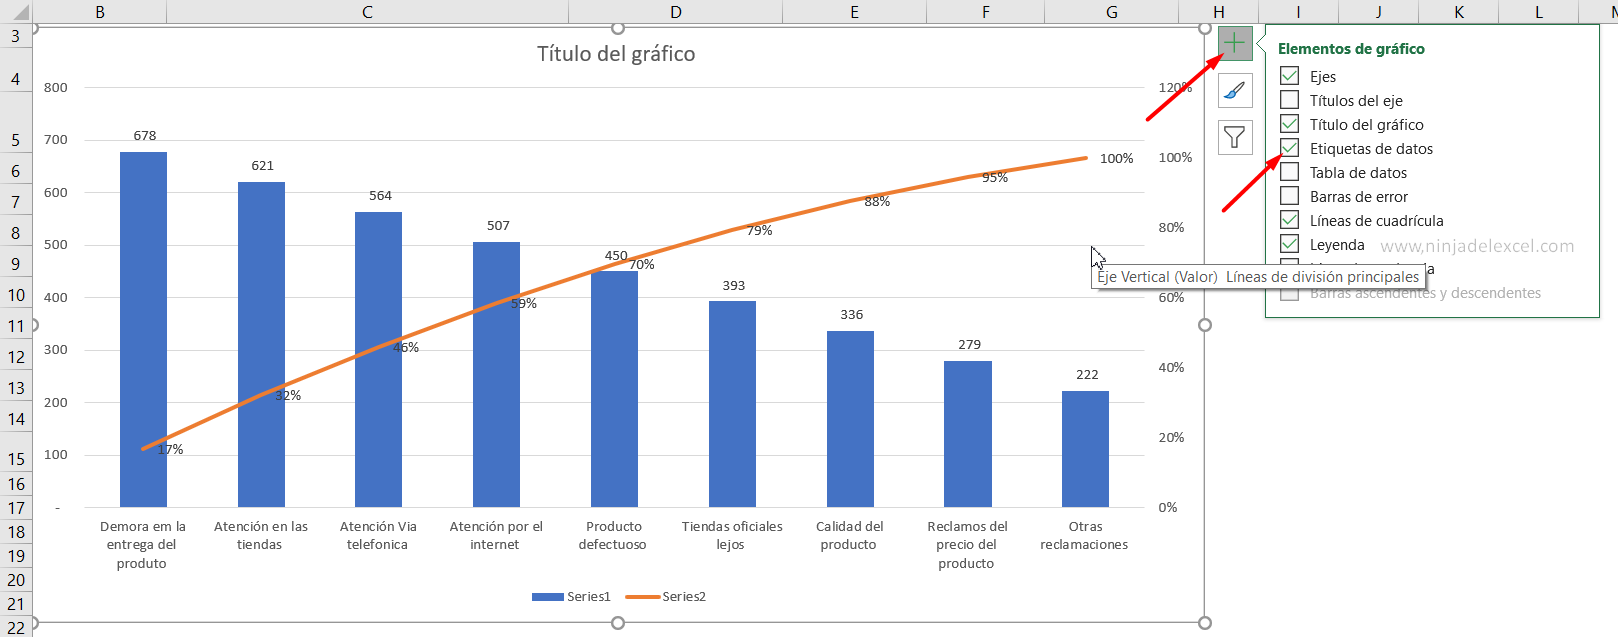 Curso completo de ExcelCurso completo de Excel